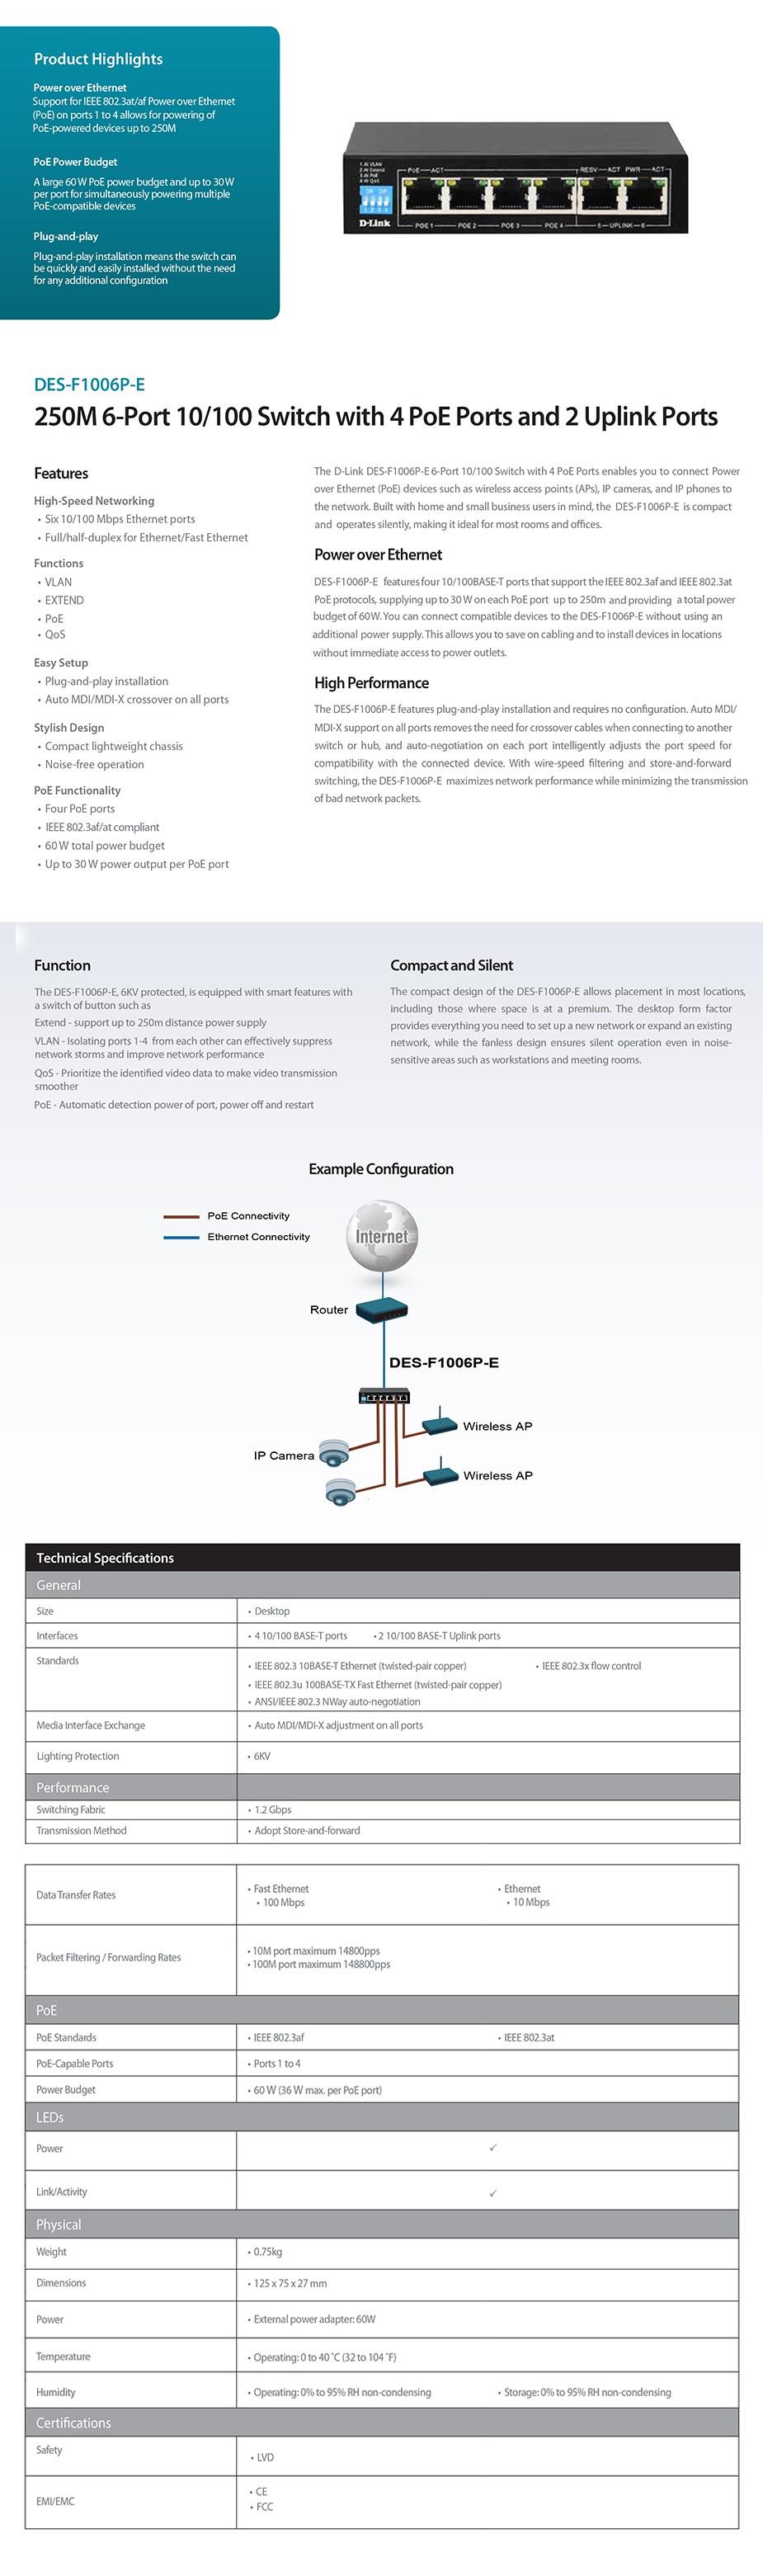 D-Link DES-F1006P-E 250M 6-Port 10/10 Switch with 4 PoE Ports/2 Uplink Ports - Overview 1